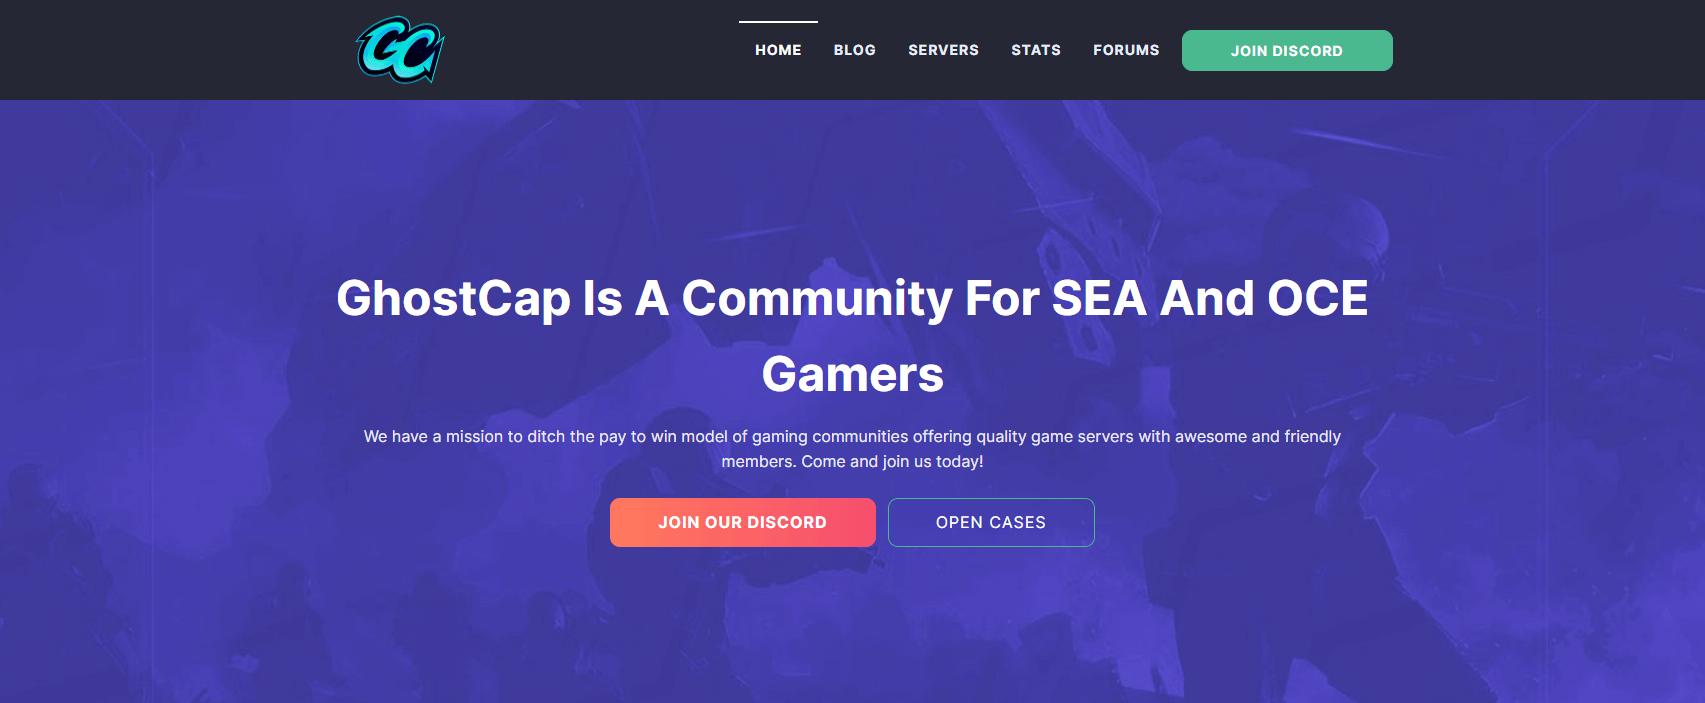 vultr for web hosting ghostcap gaming